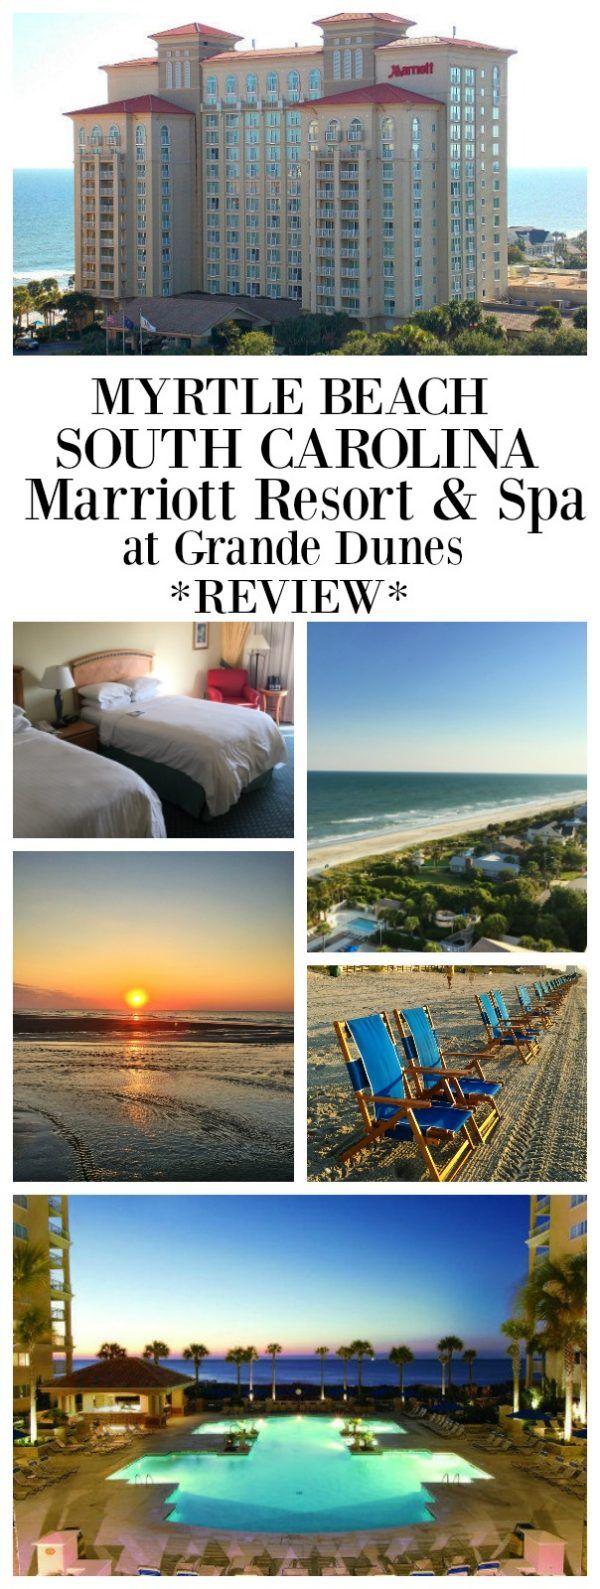 Myrtle Beach Marriott Resort and Spa- a review by RecipeGirl.com